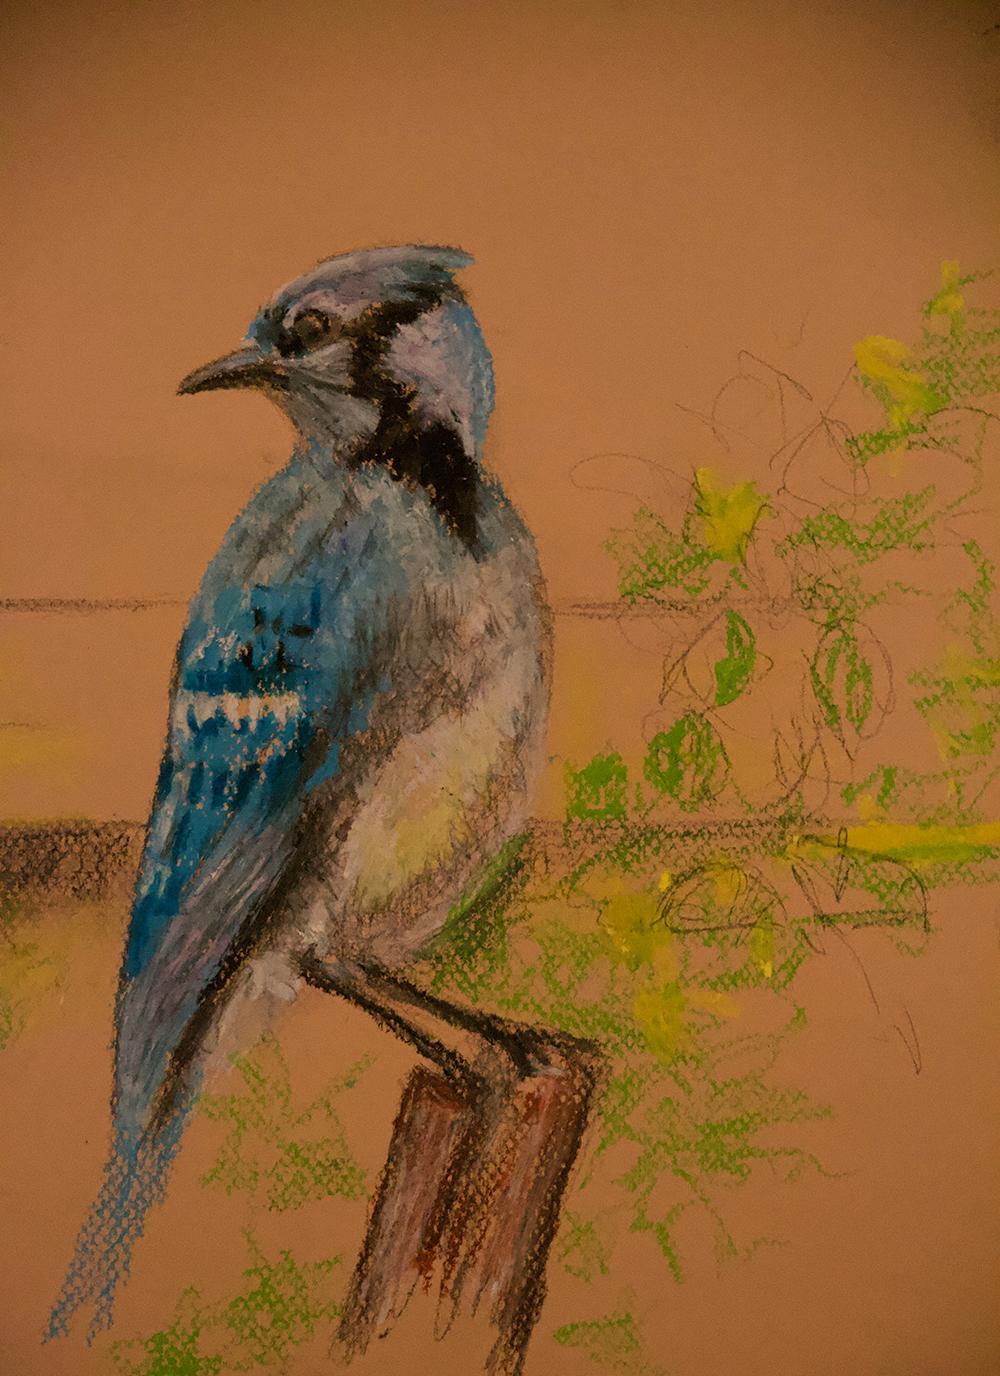 Blue Jay in Back Yard